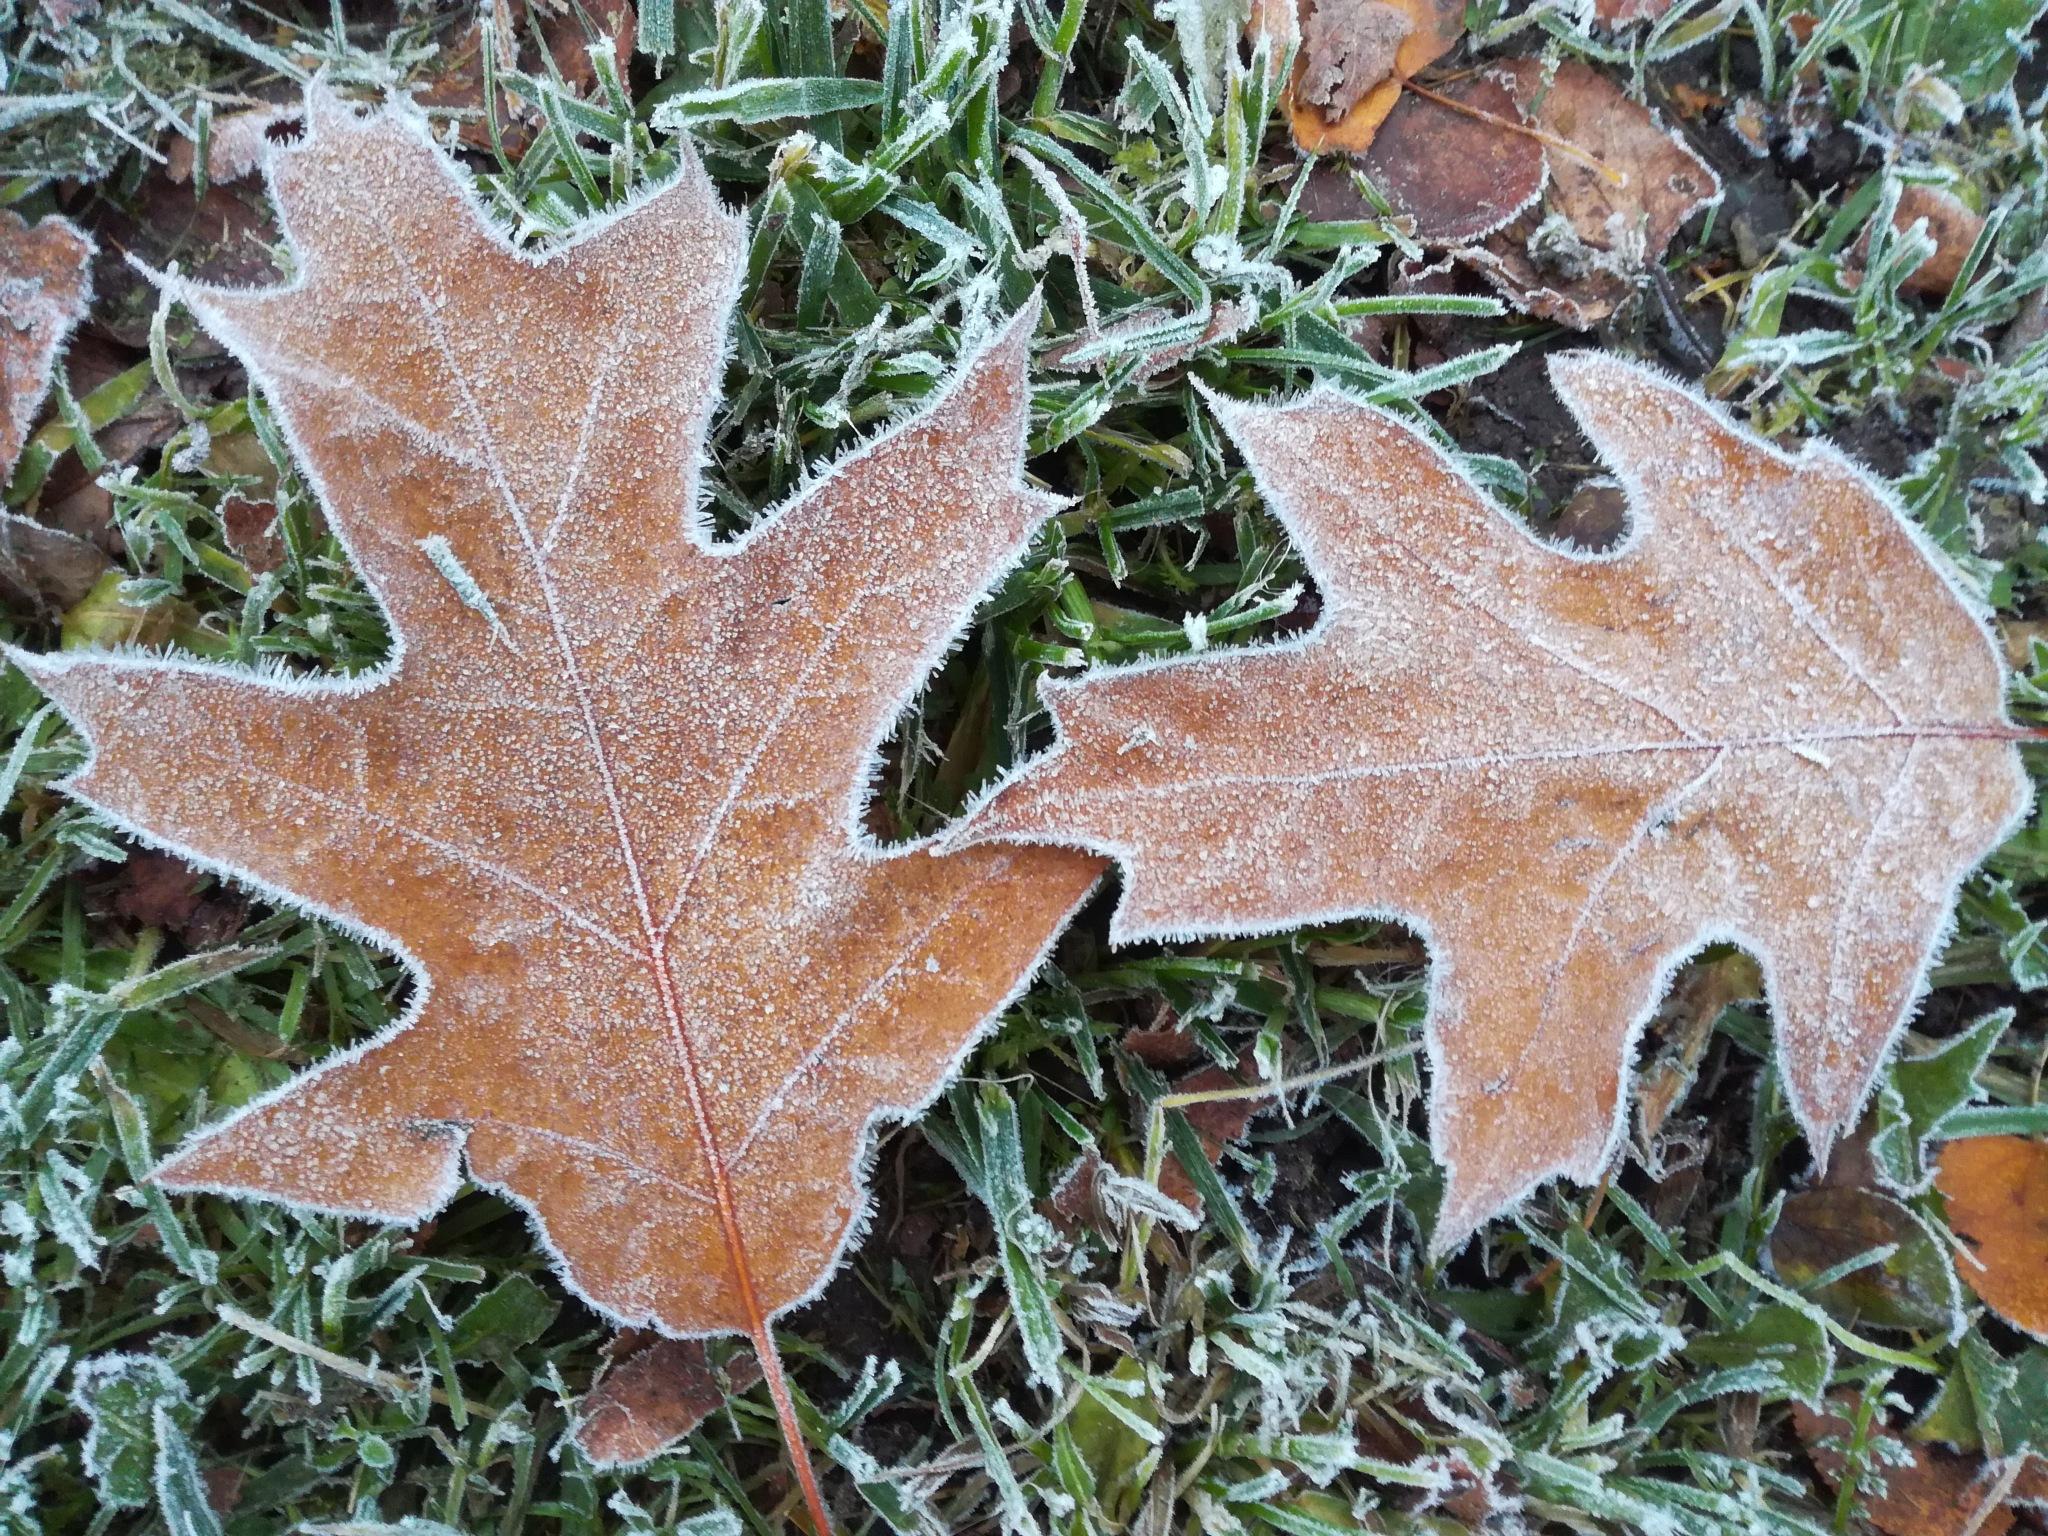 Dry leaves by uzkuraitiene62